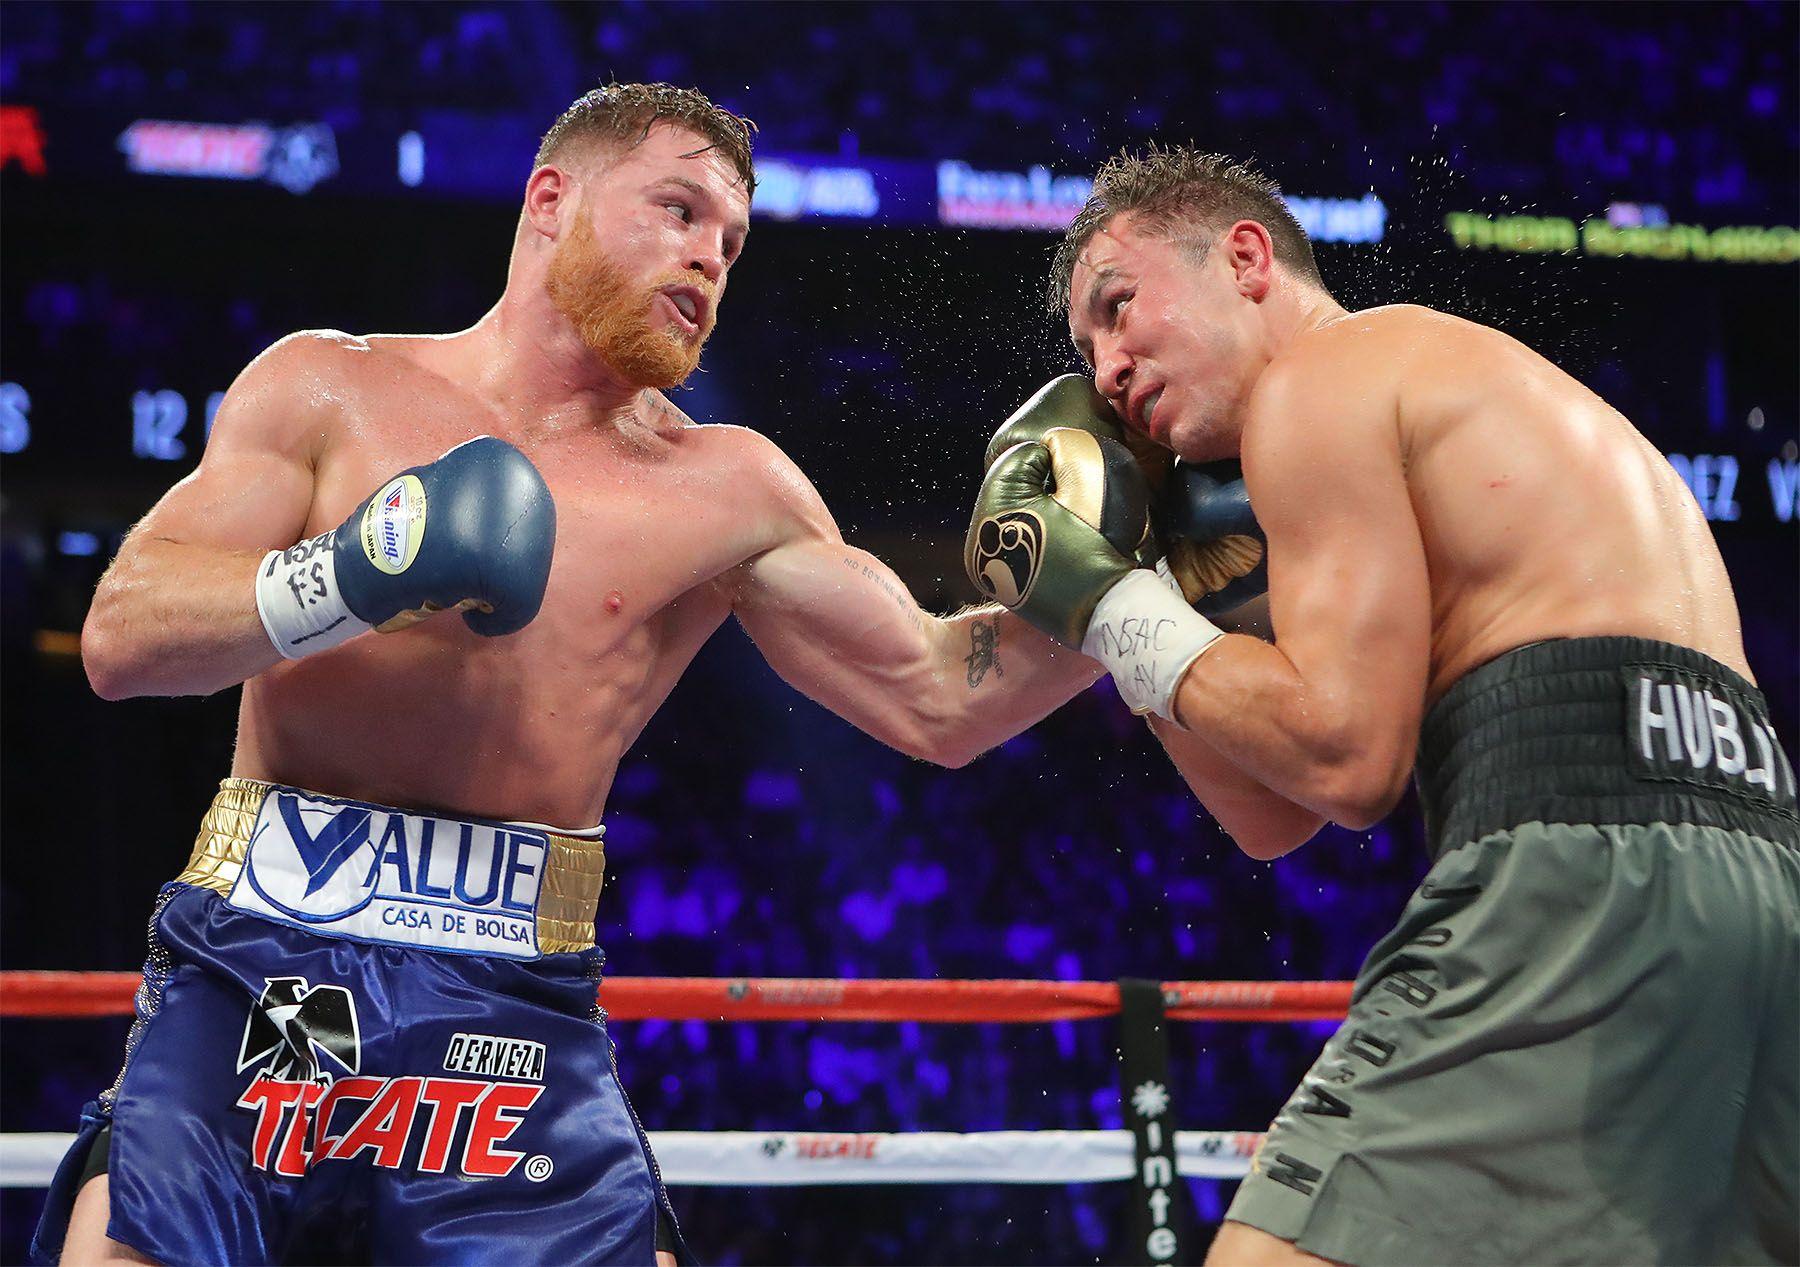 Golovkin y Álvarez dan el mismo peso de 72,640 kilos para pelea del sábado